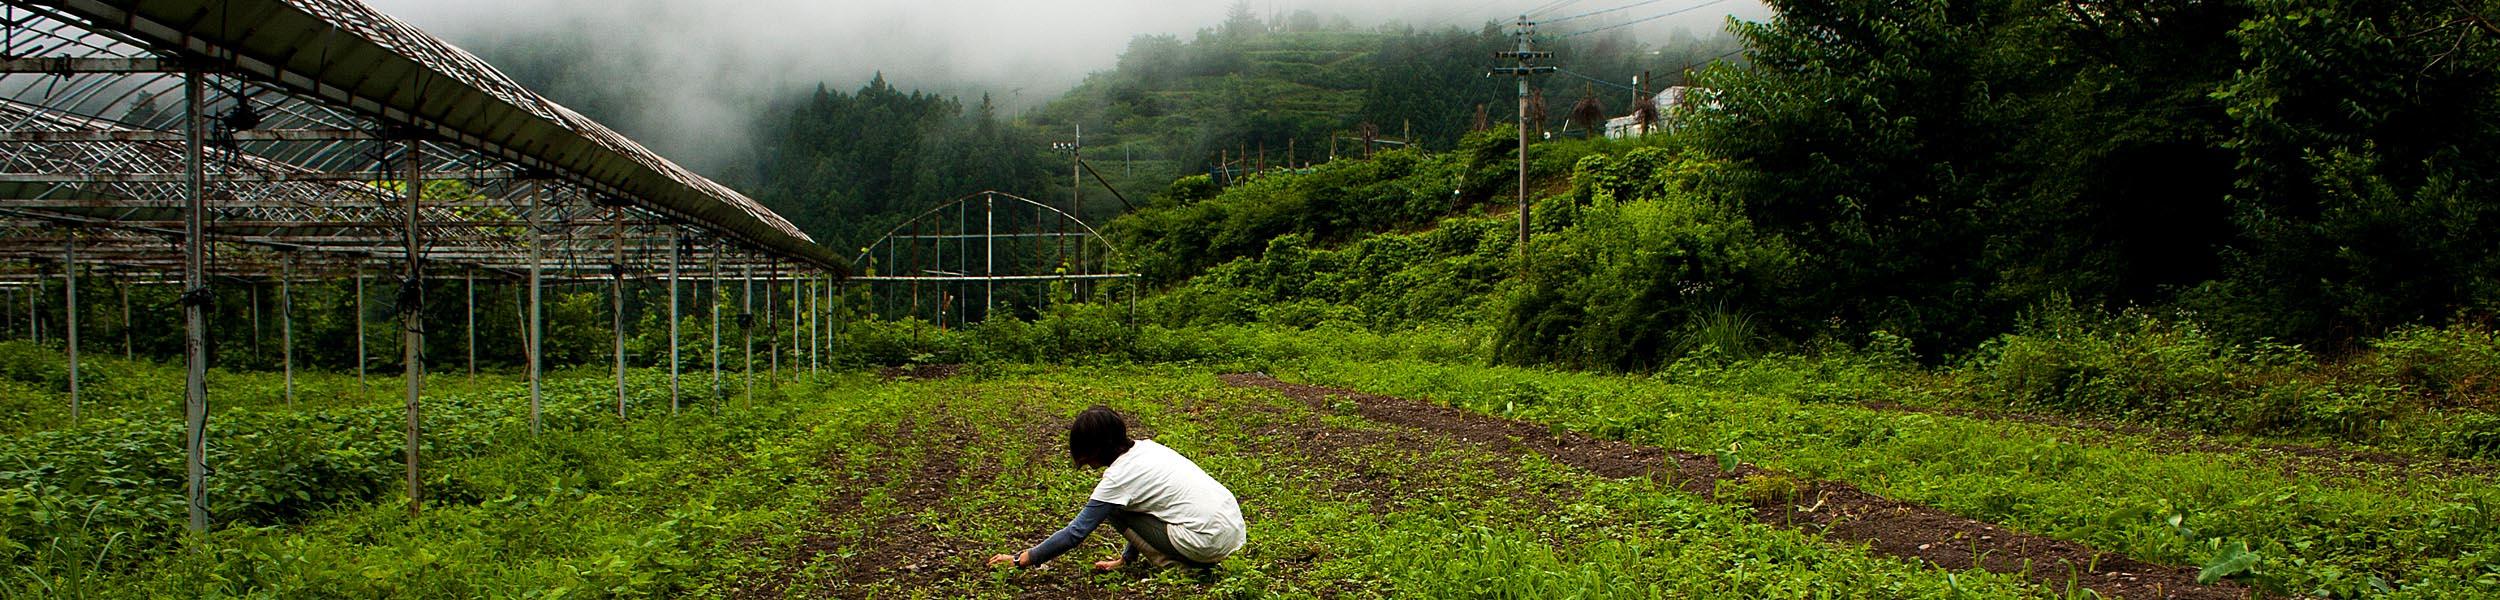 Narumi Farm